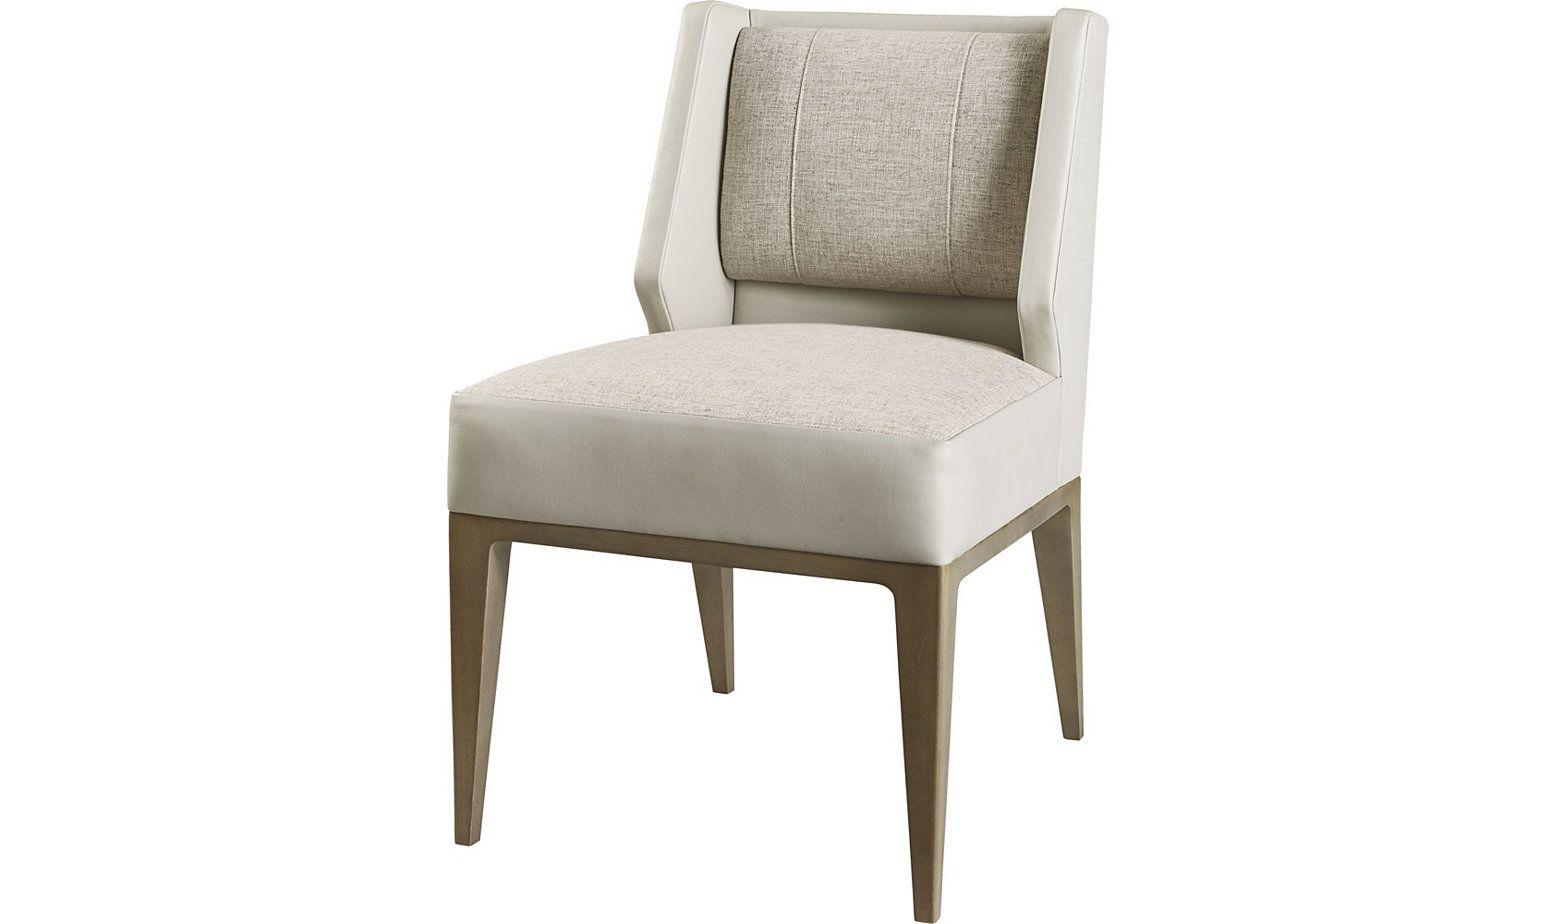 Kukio Side Chair By Barbara Barry 3340 Baker Furniture